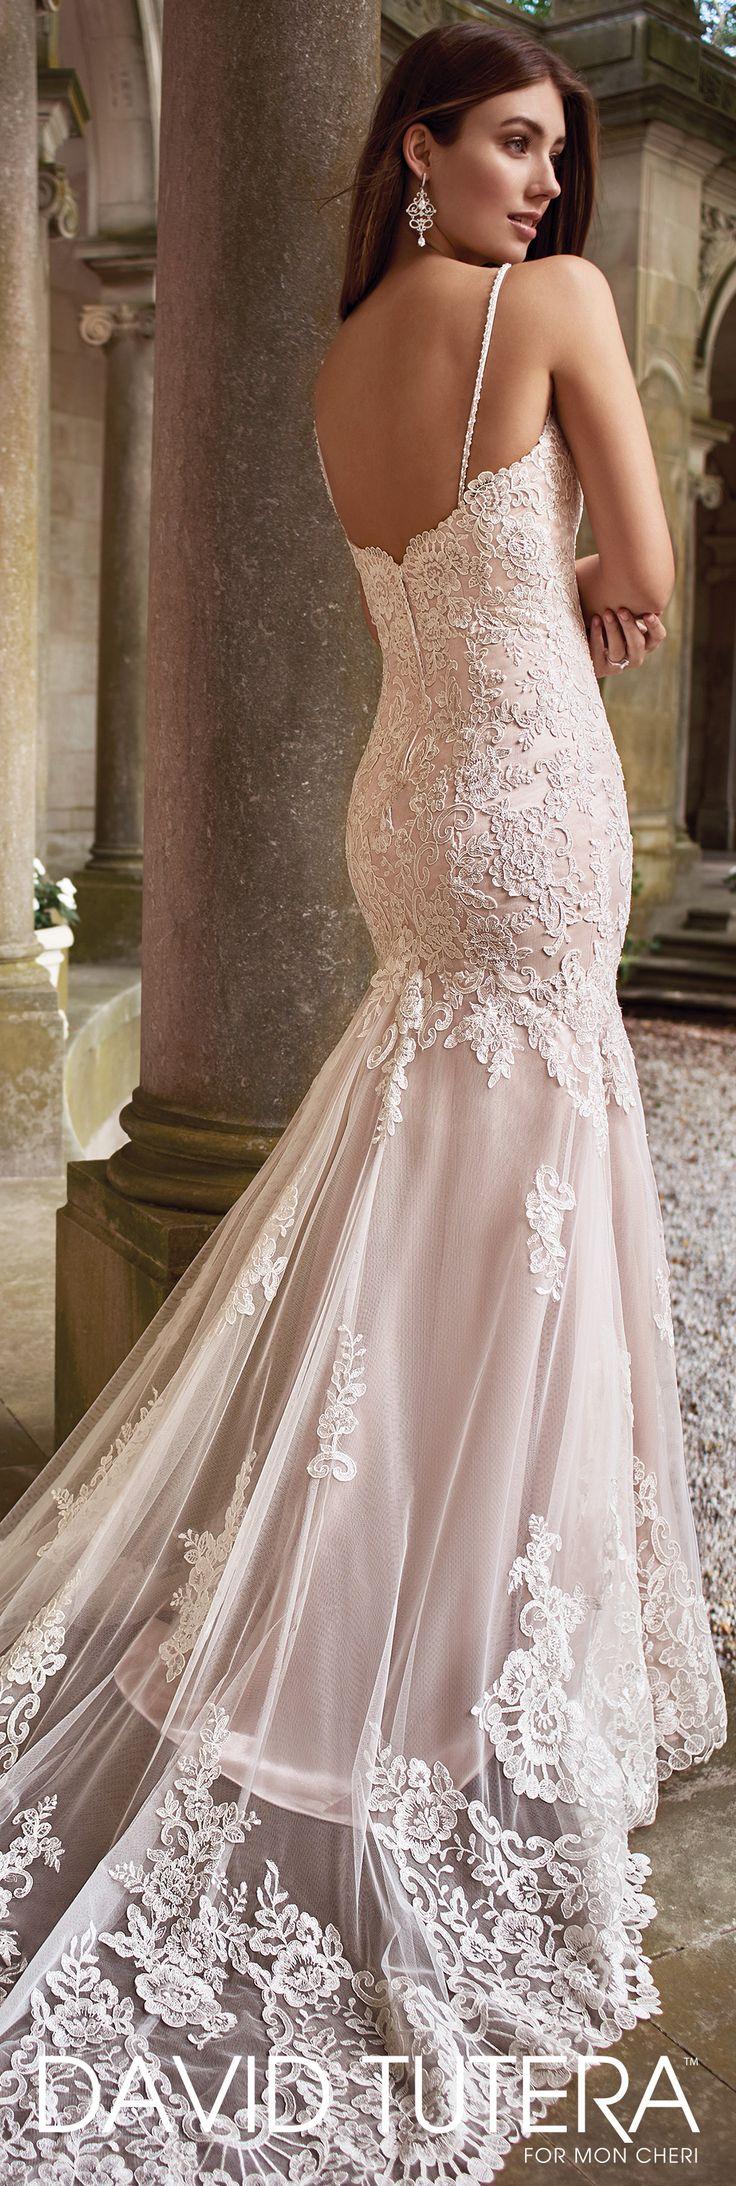 Lace spaghetti strap wedding dress   best Wedding Dresses images on Pinterest  Wedding dressses